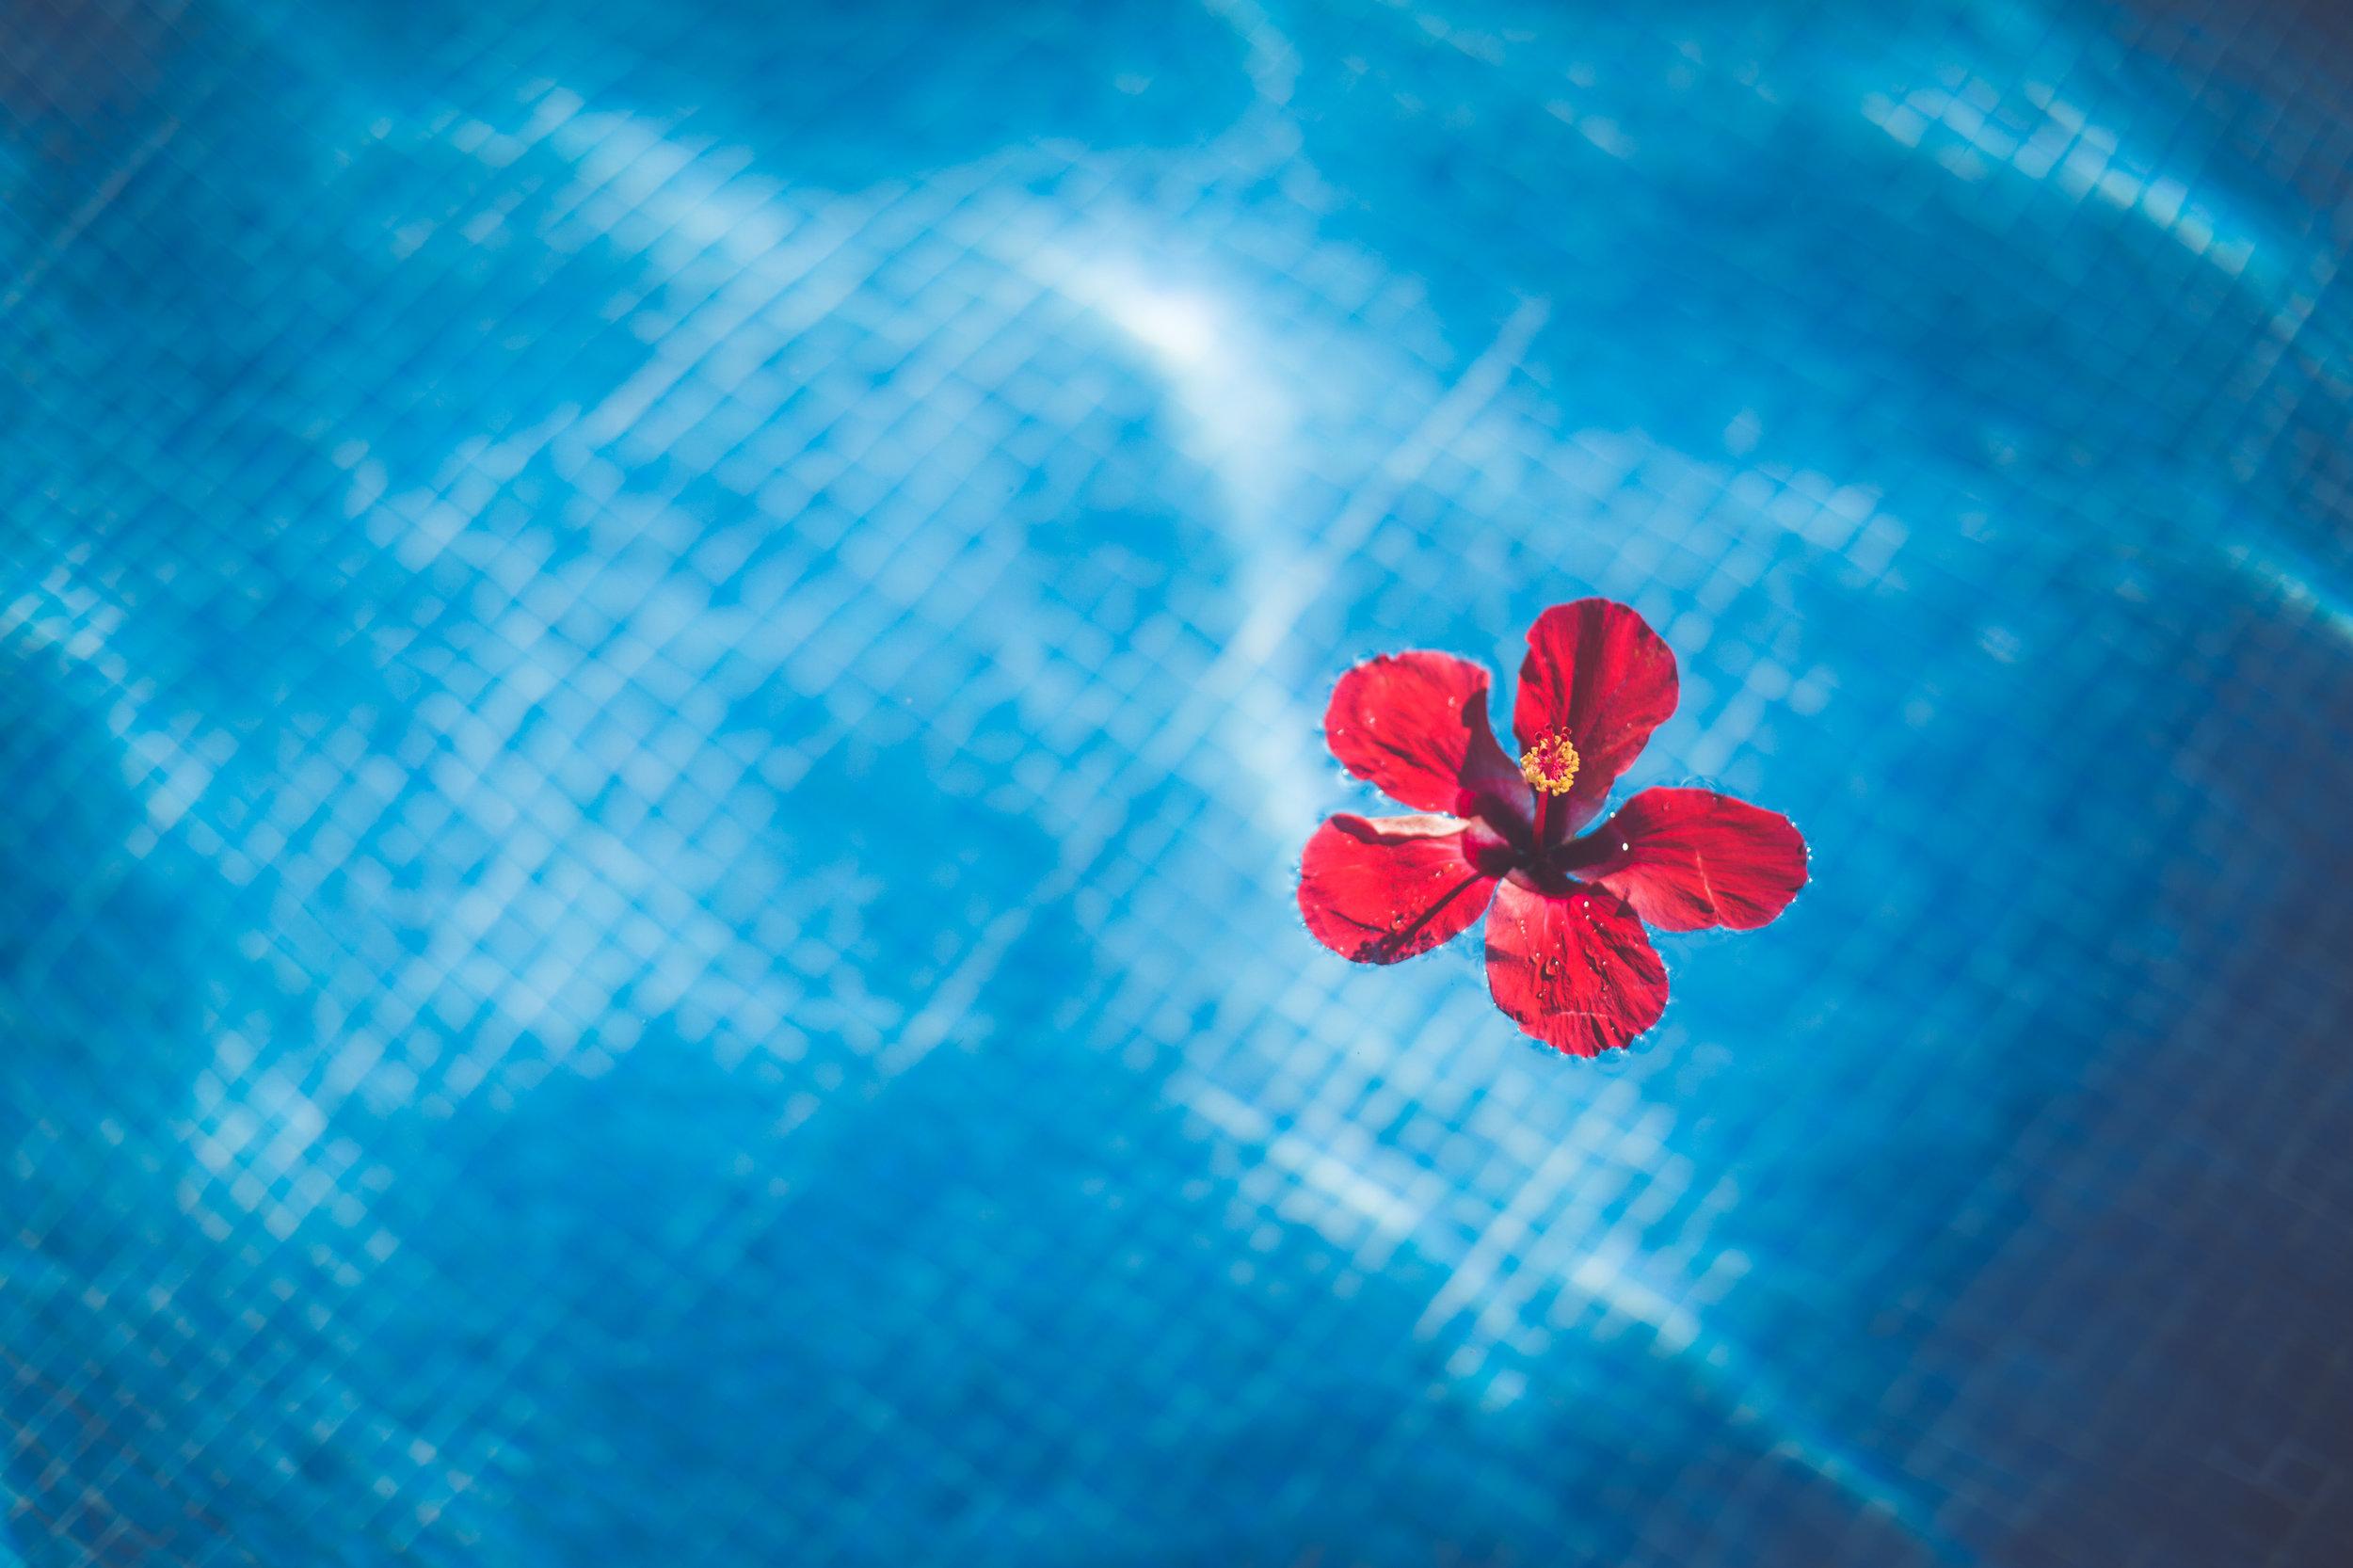 hibiscus flower at sunset princess resort wedding in playa del carmen mexico